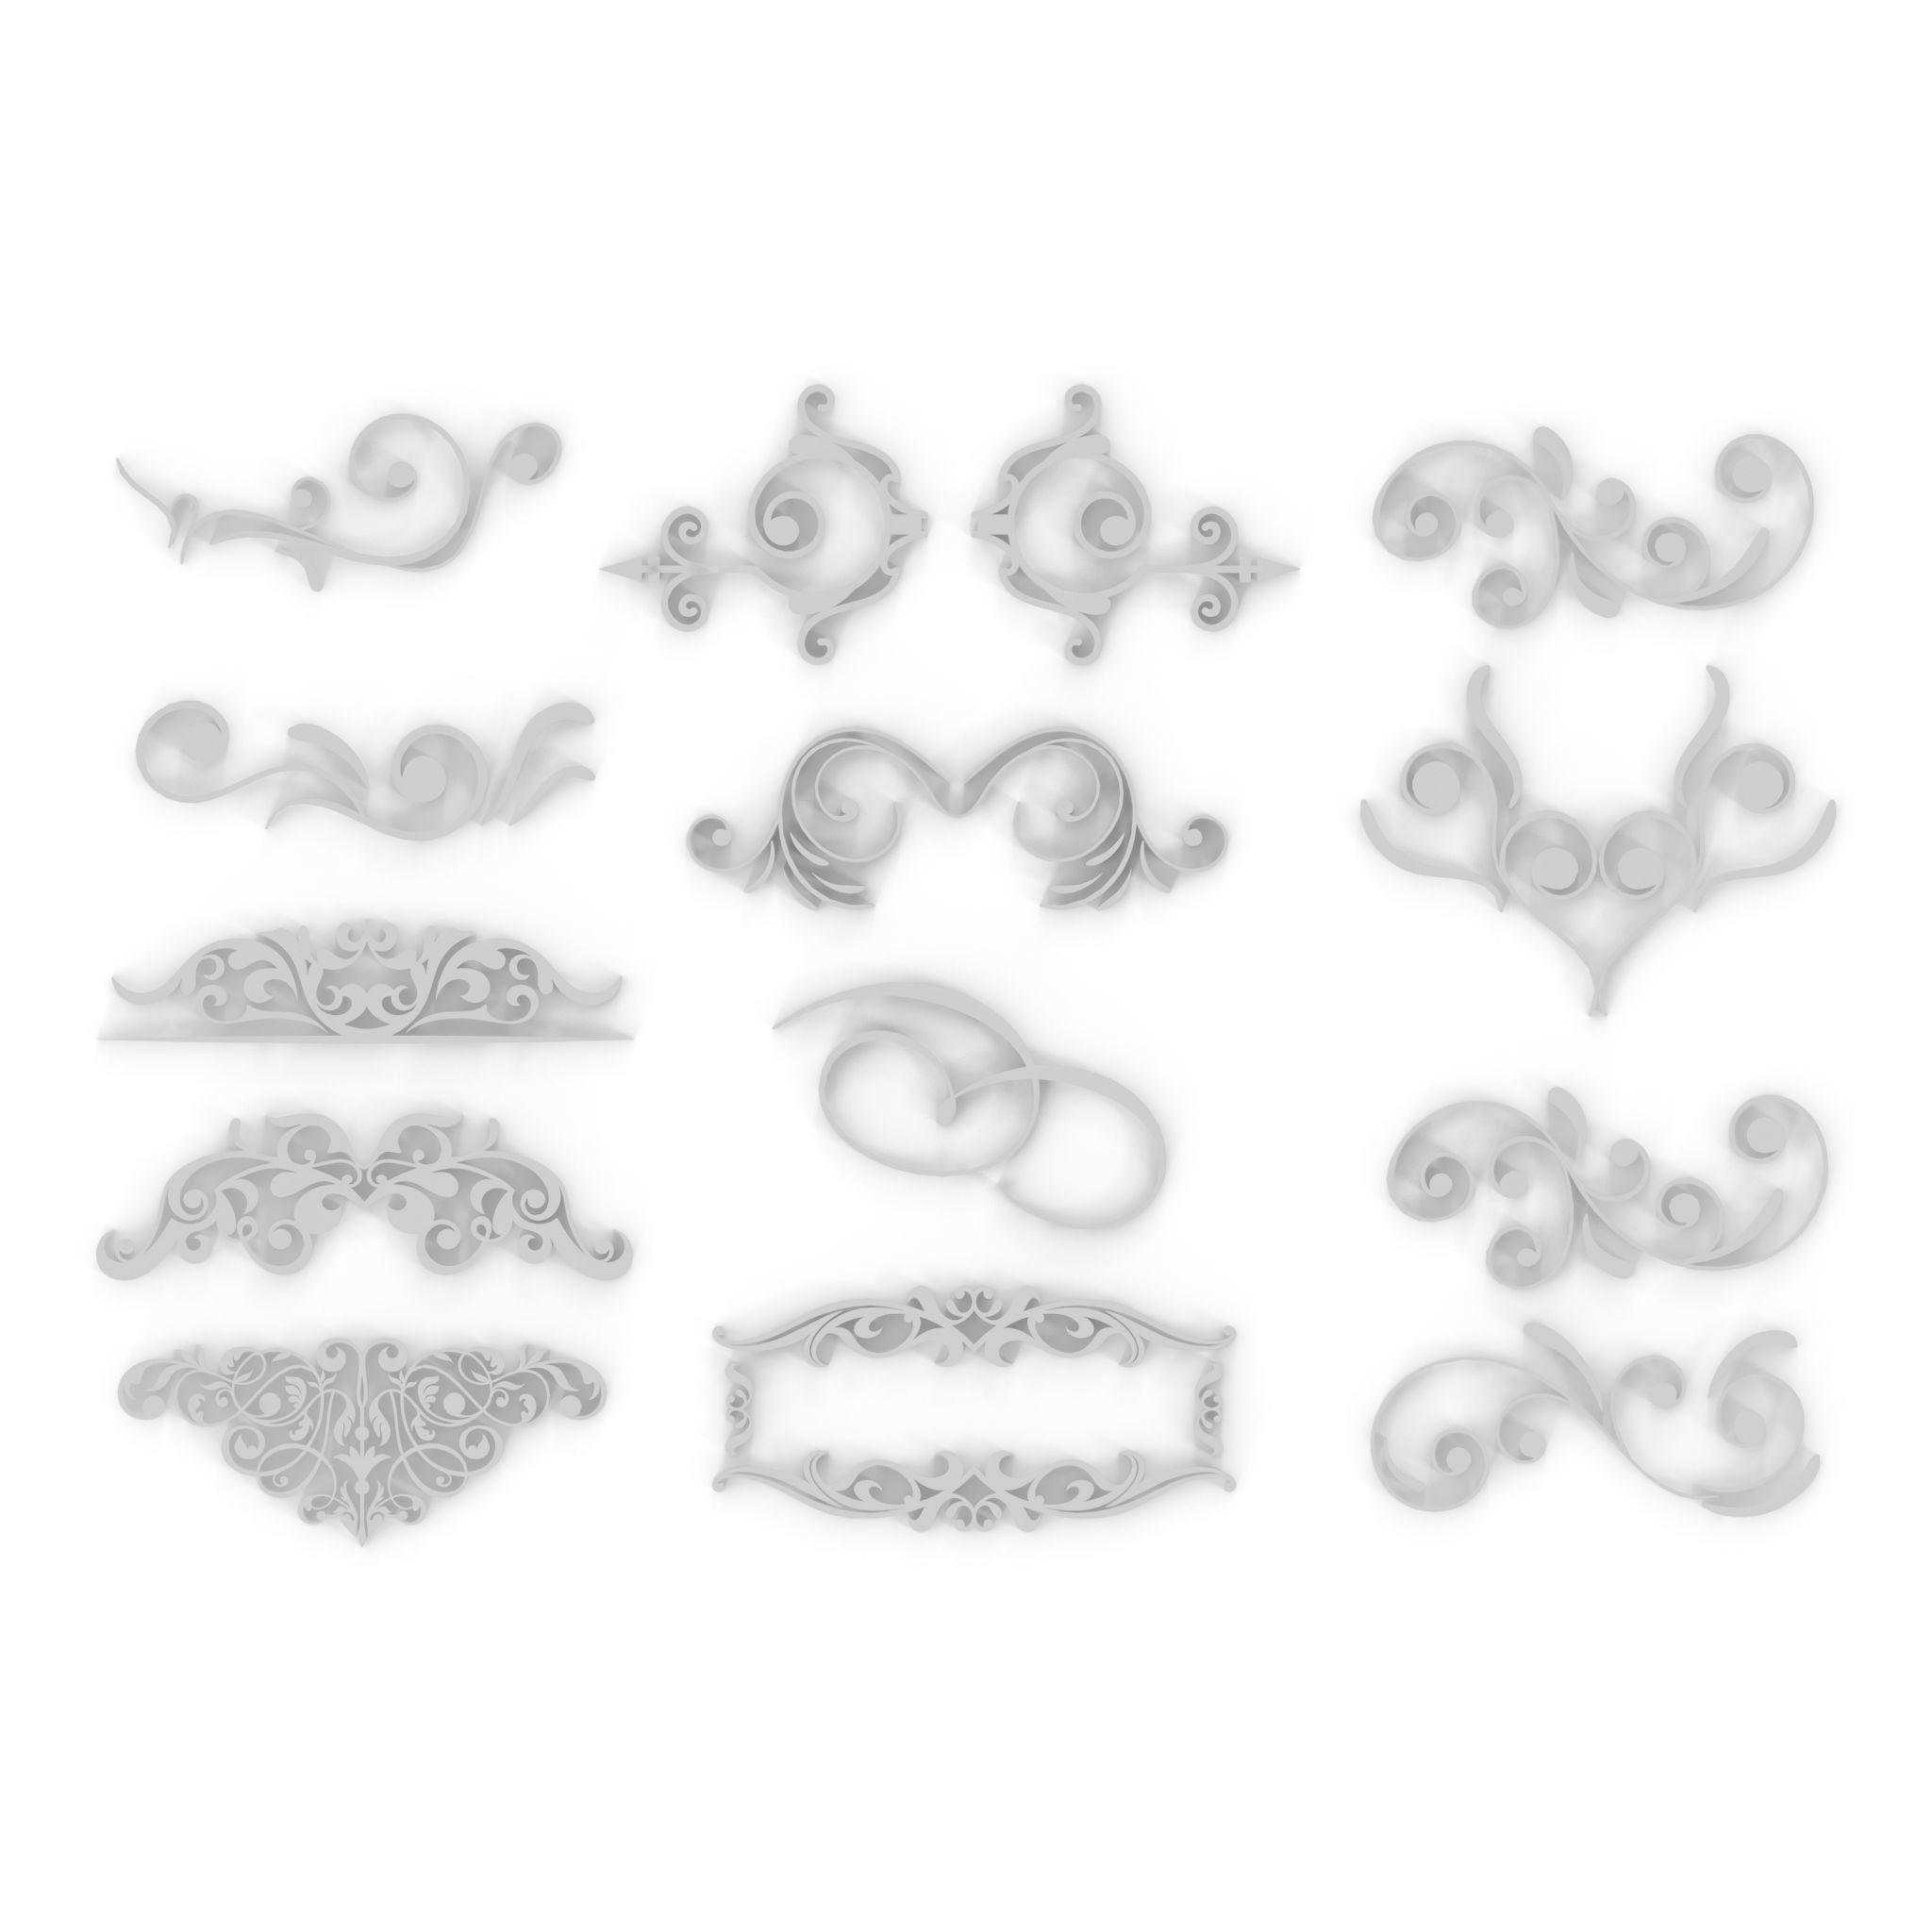 Ornate Swirls 04 Set